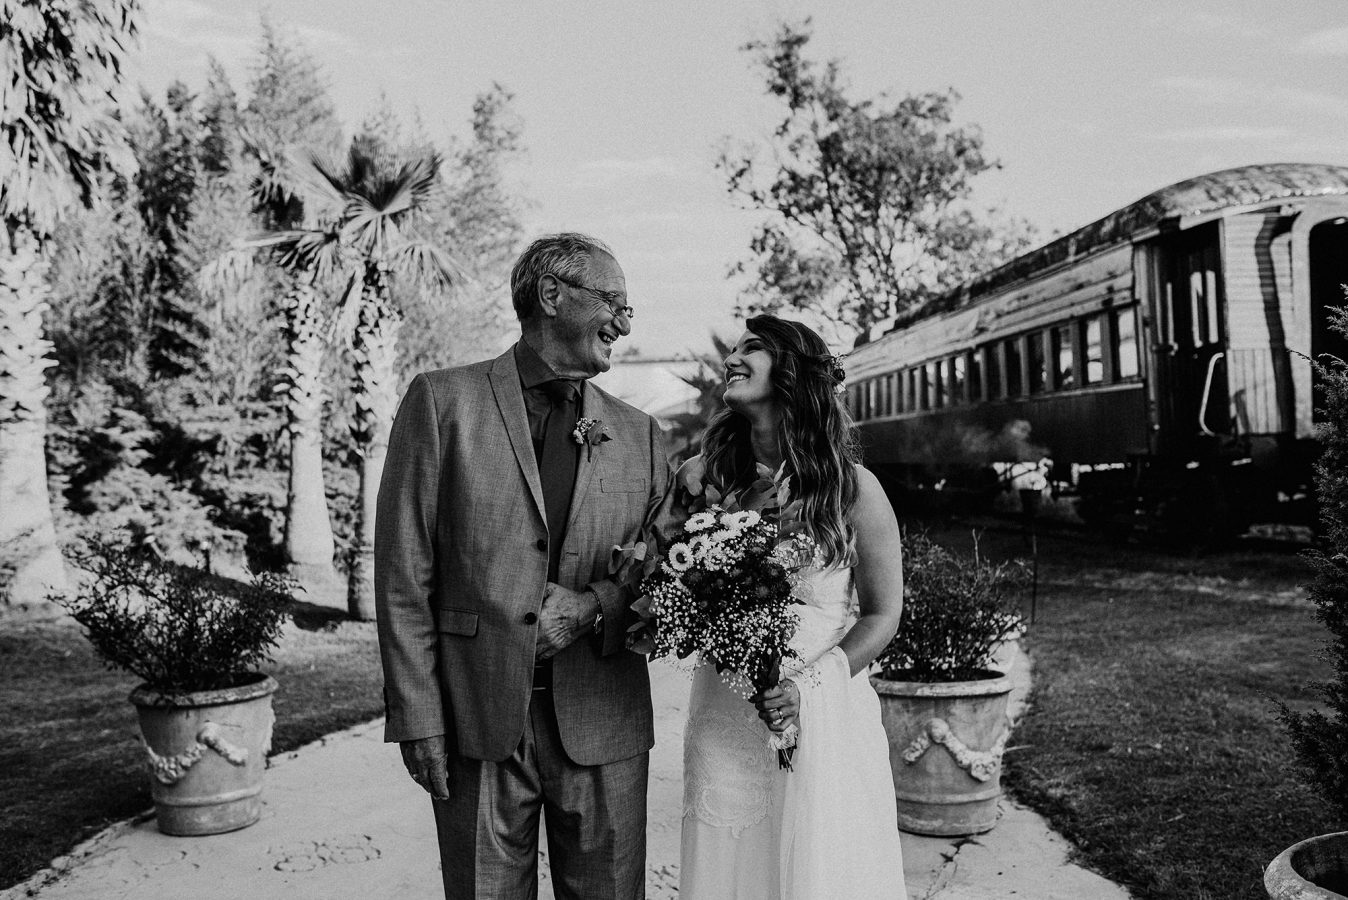 fotografos-de-boda-uruguay-8